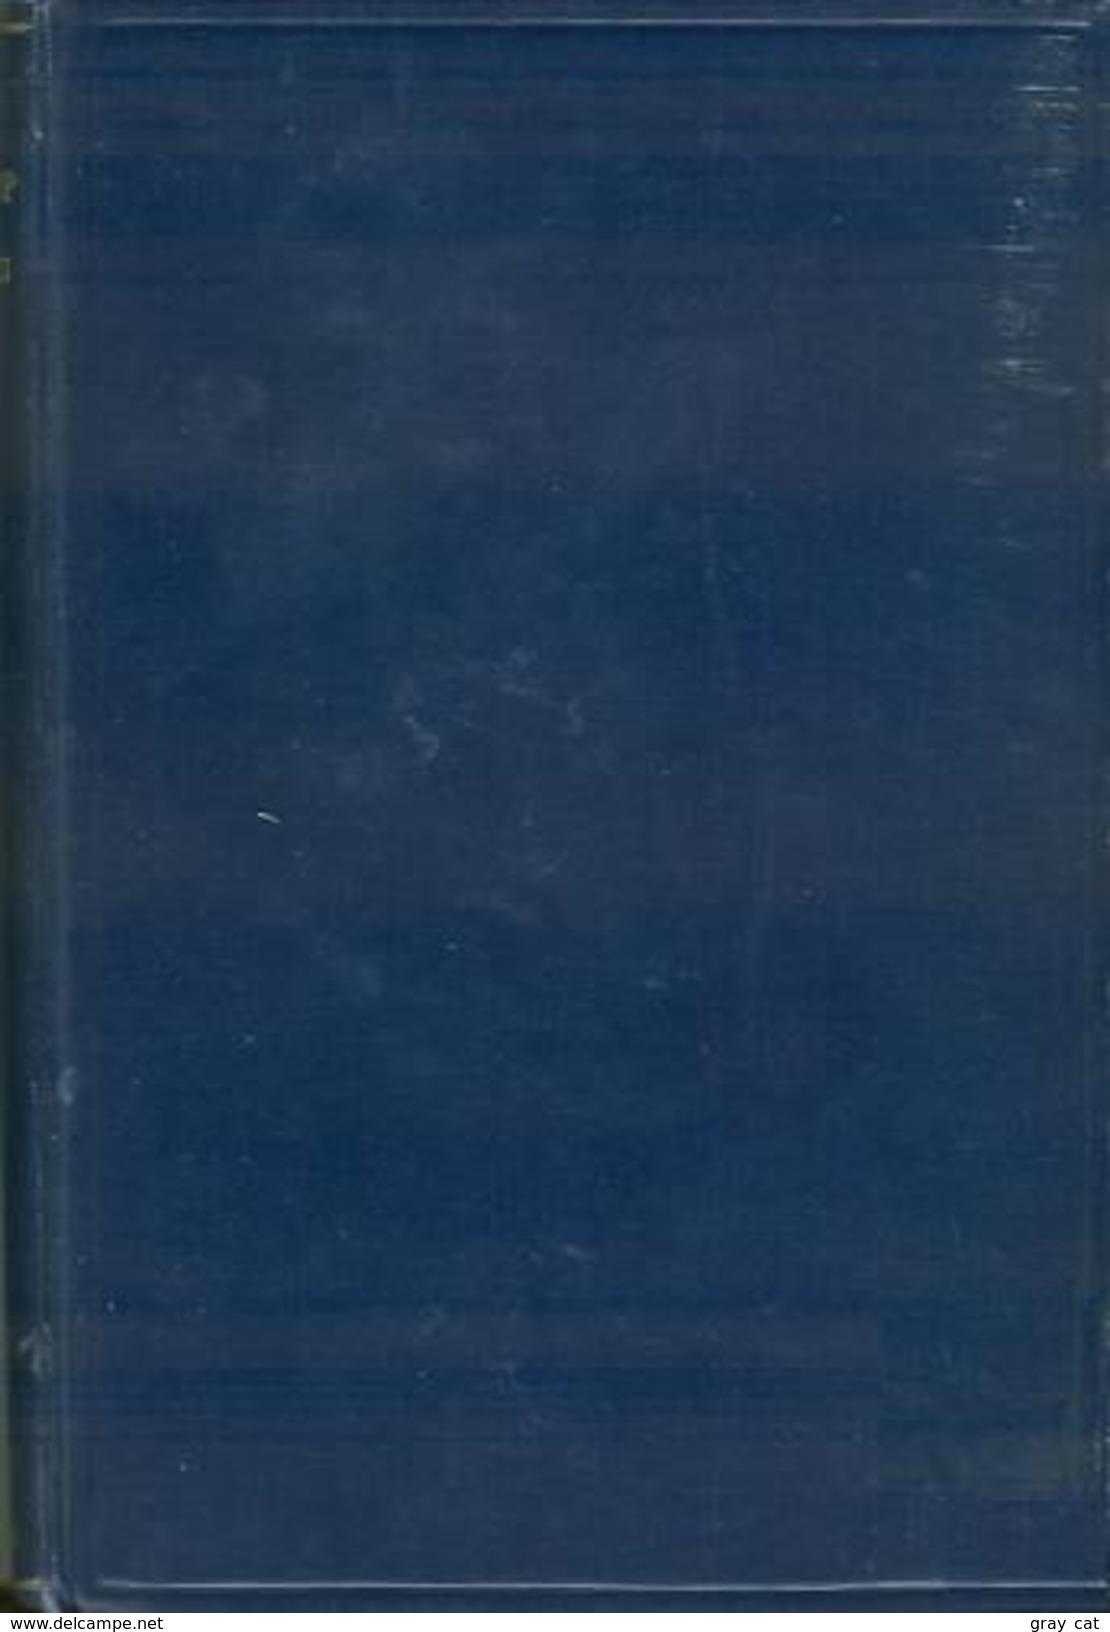 CLUB LEADERSHIP By BASIL L. Q. HENRIQUES - Old Books